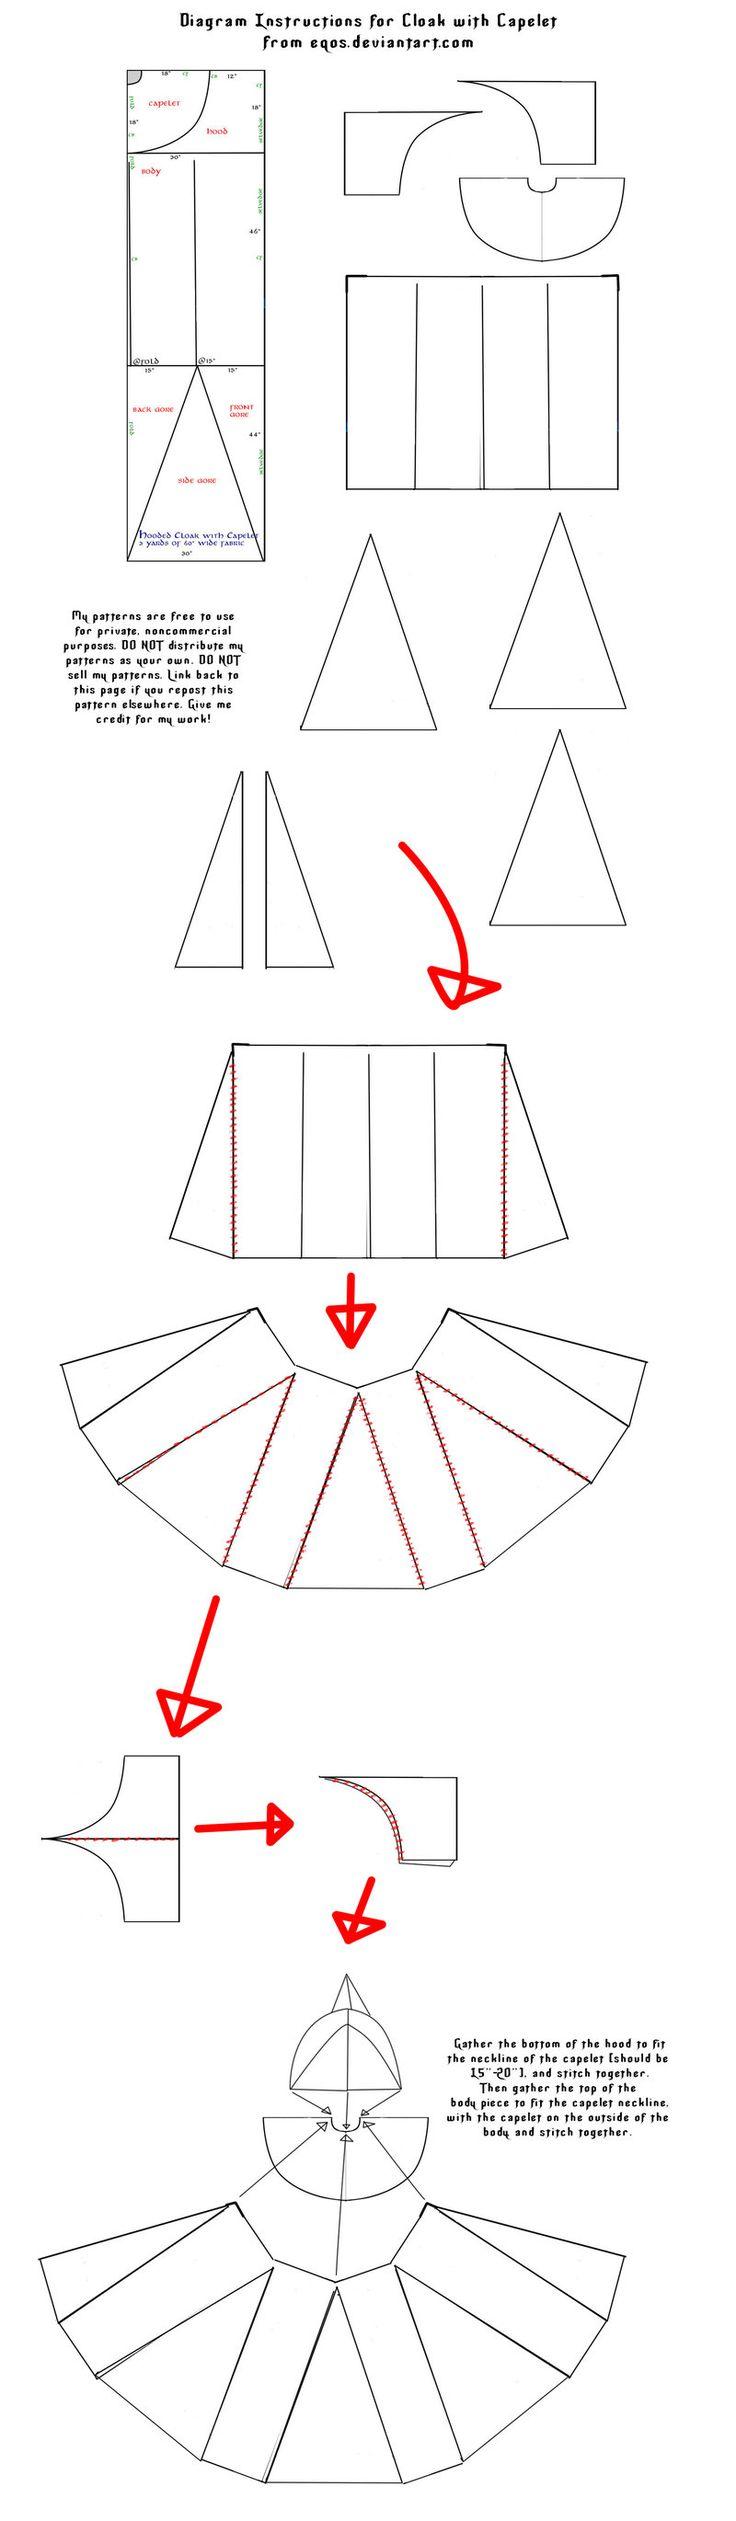 Amazing Cloak Sewing Pattern Image - Decke Stricken Muster ...